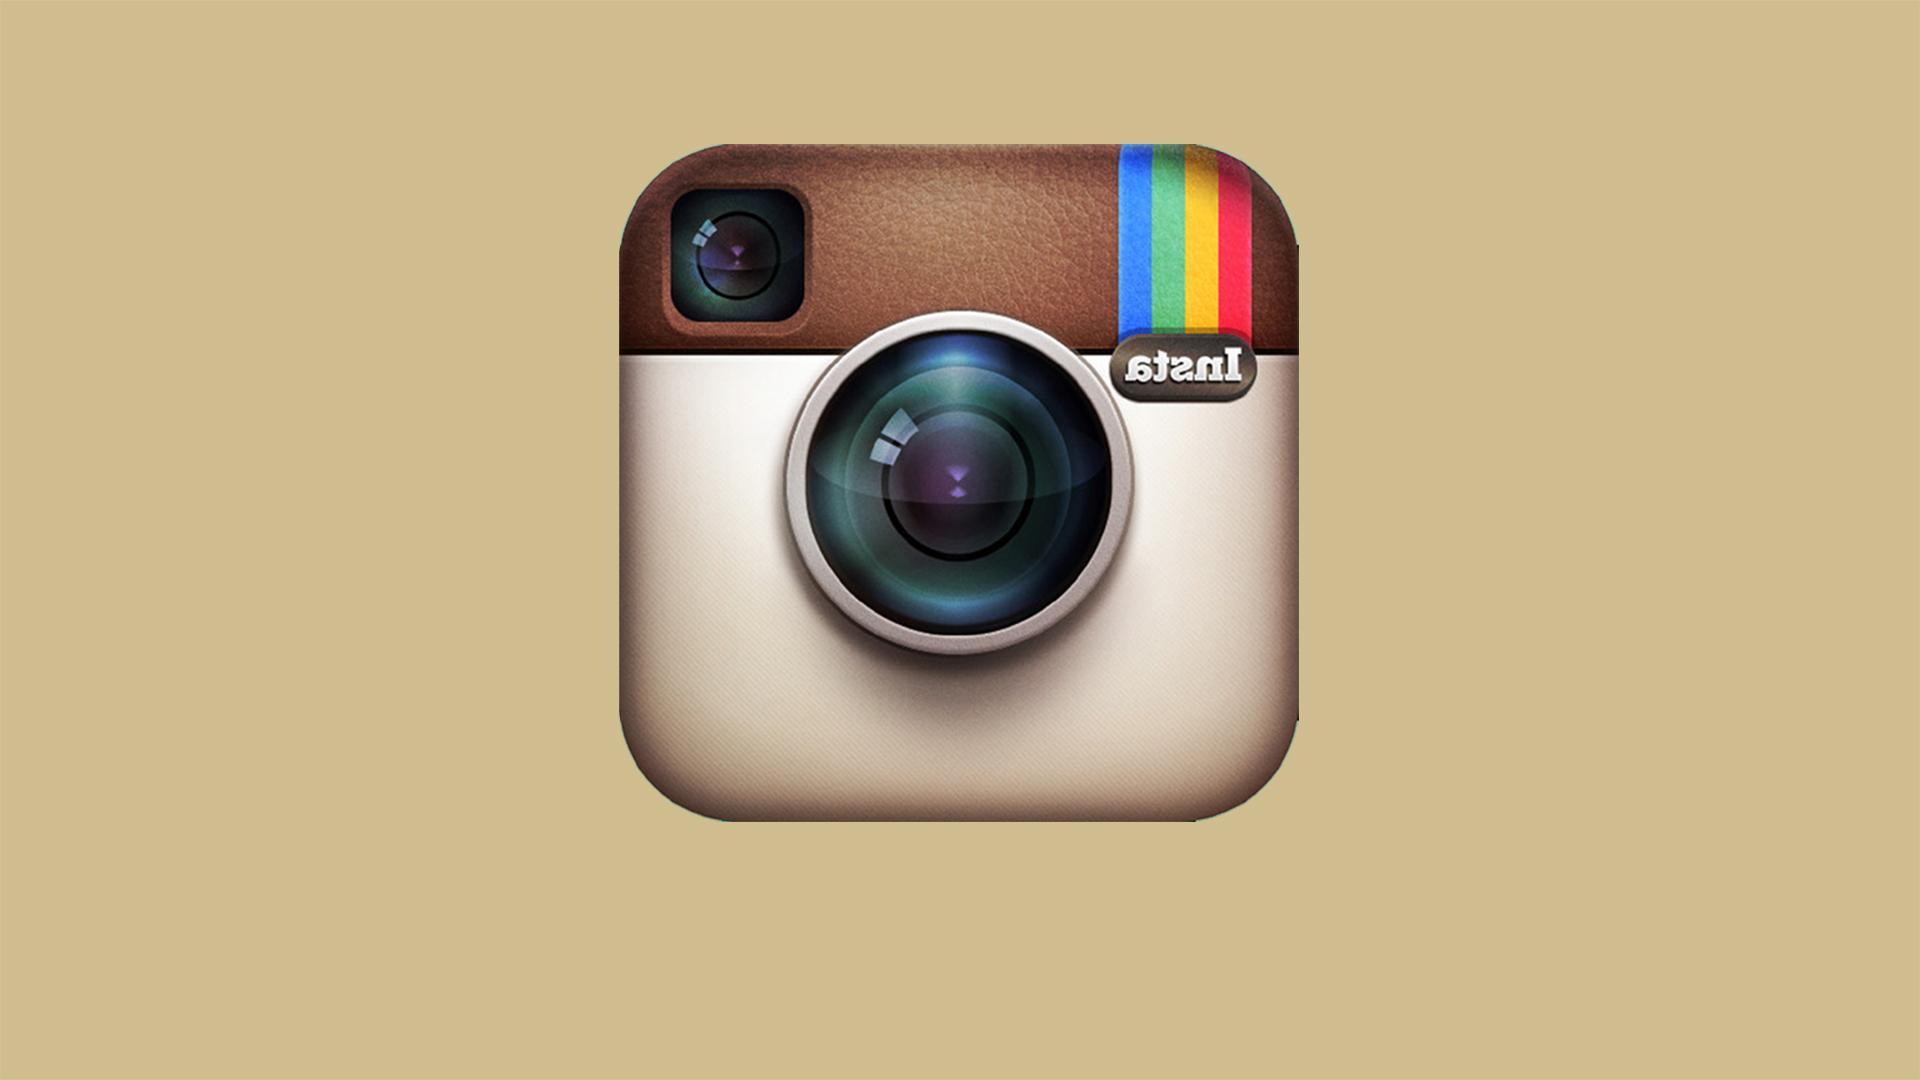 Wonderful Instagram Logo HQ Wallpapers Worlds Greatest Art Site 1920x1080